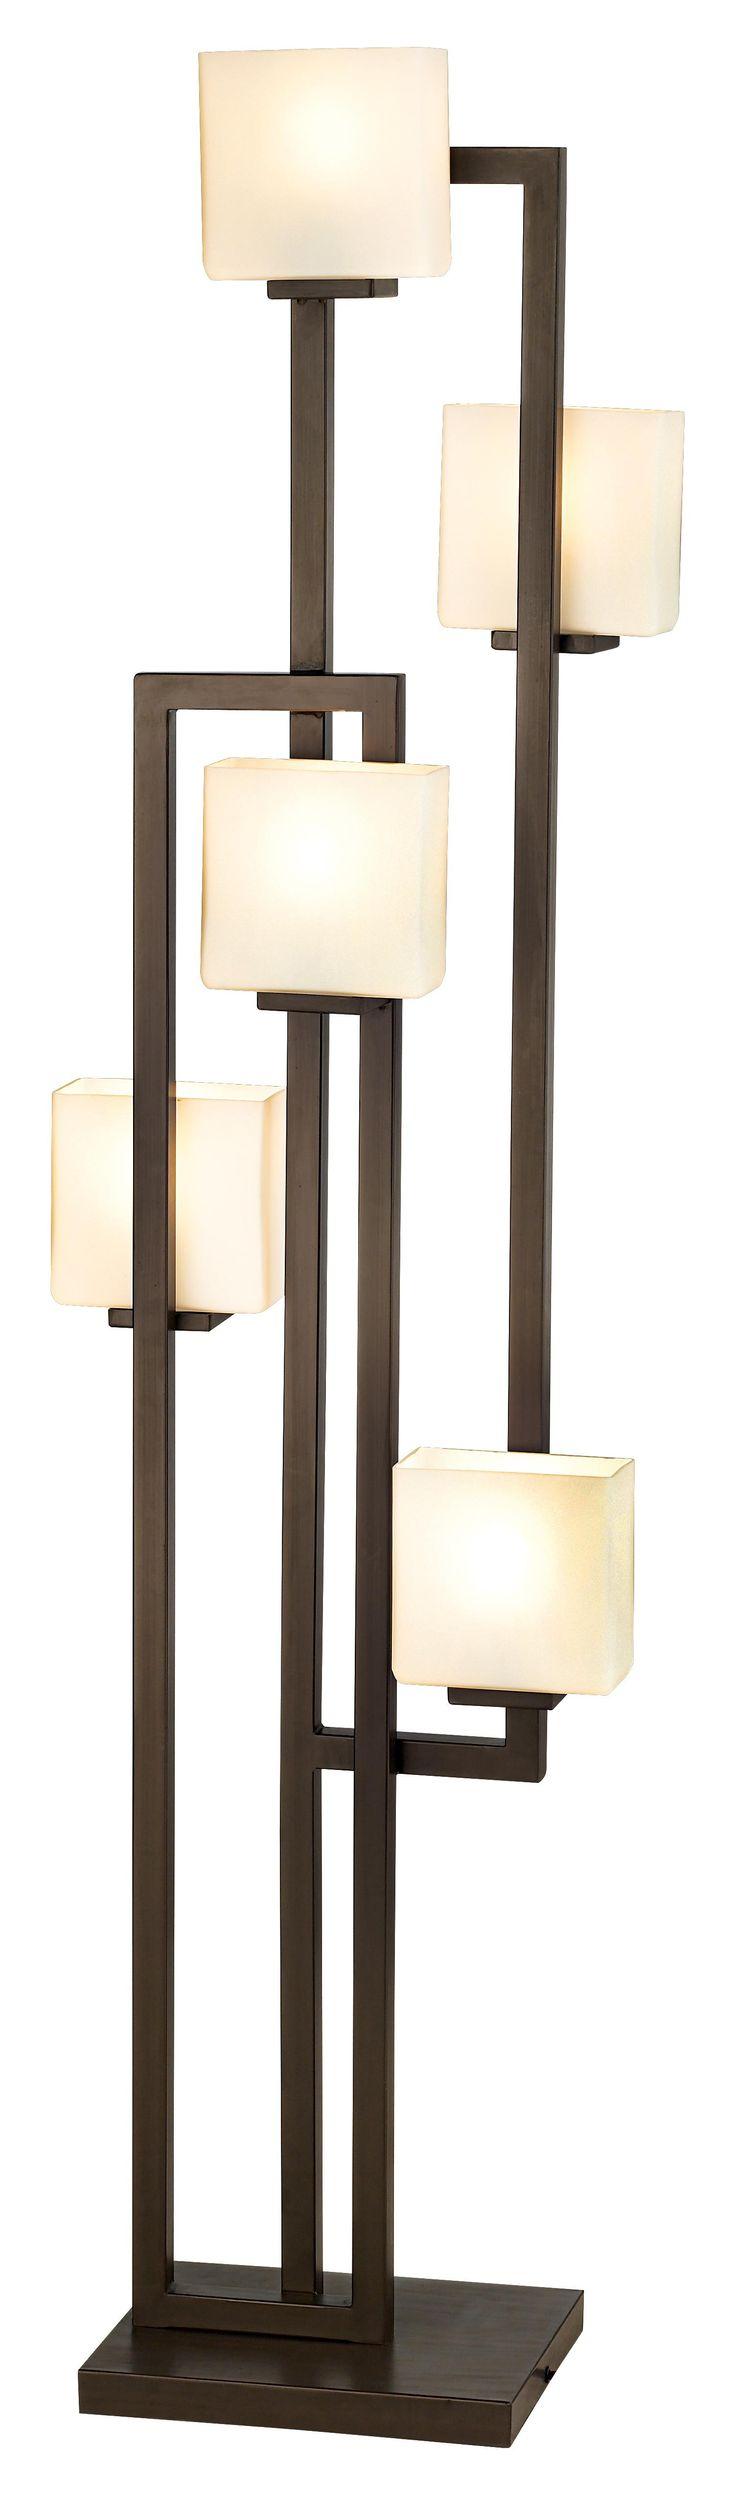 Possini Euro Lighting on the Square 5-Light Floor Lamp -